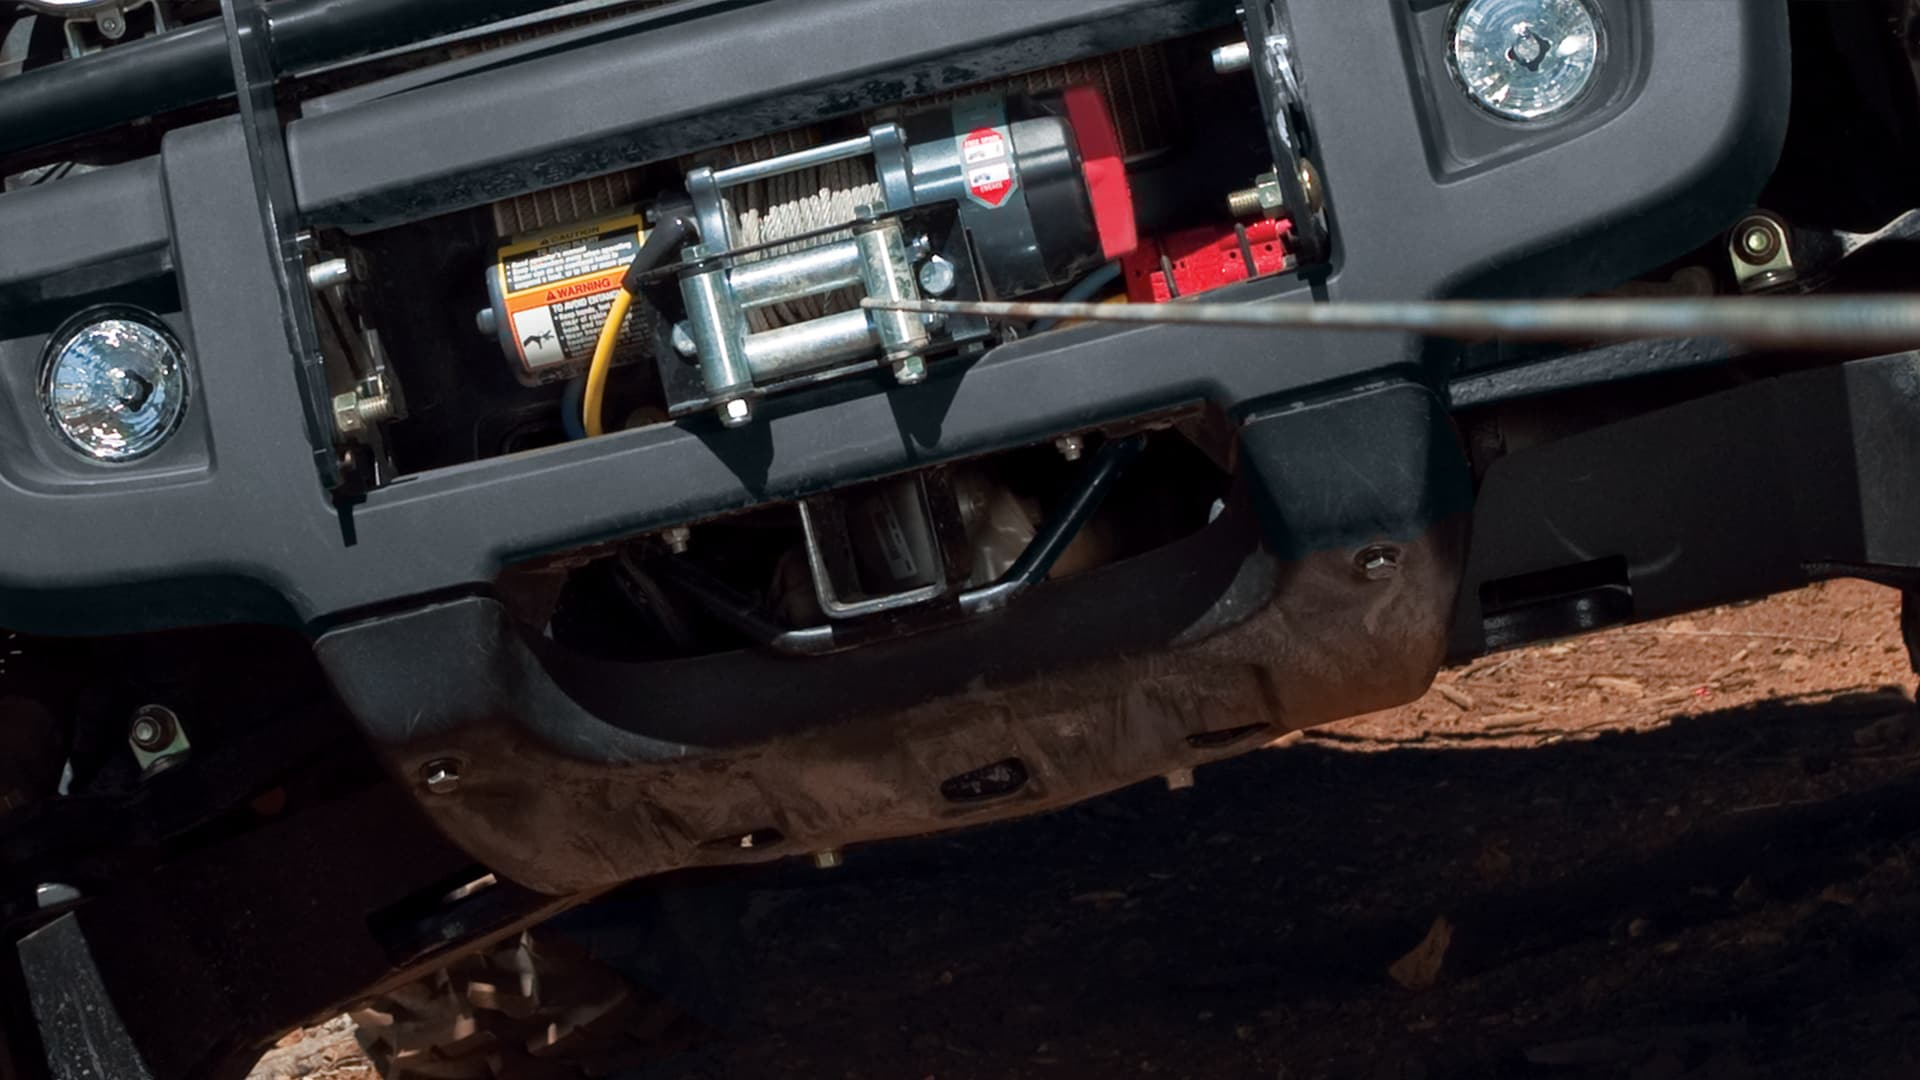 Gator 590i Accessories >> Gator Utility Vehicle Attachments | John Deere US